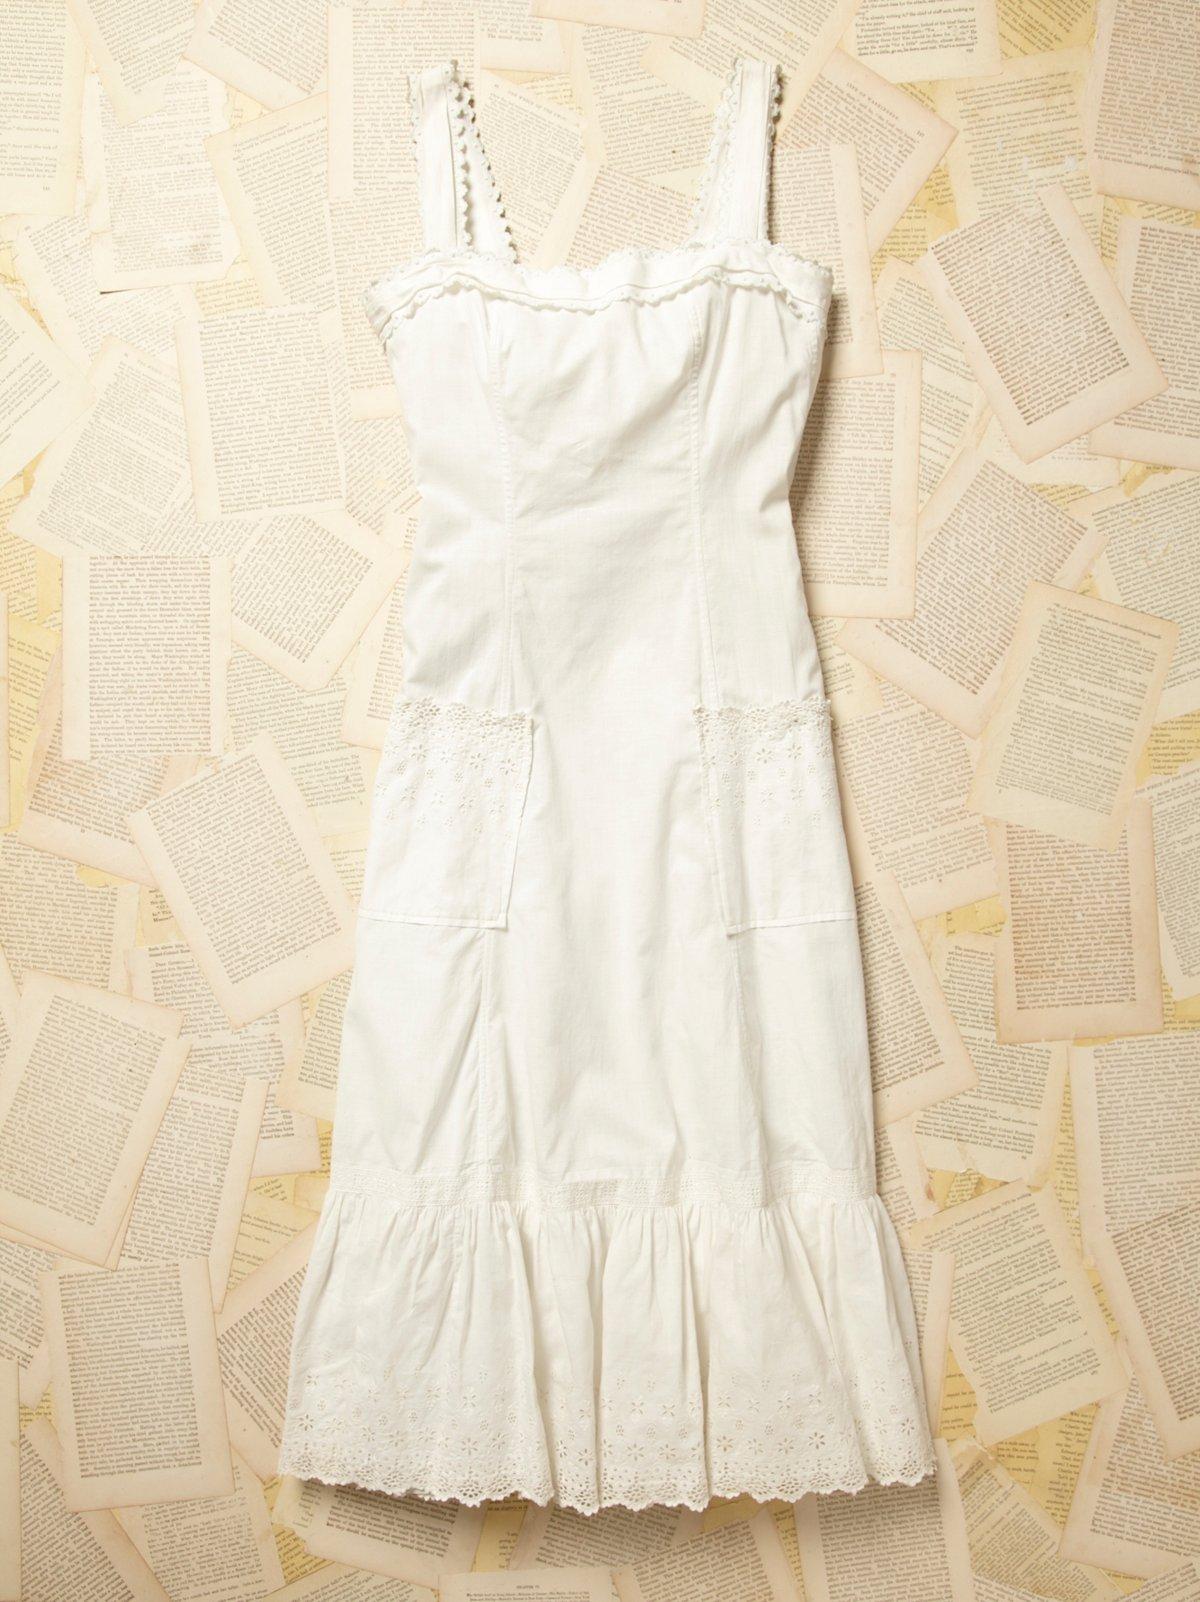 Vintage Victorian Cotton Dress